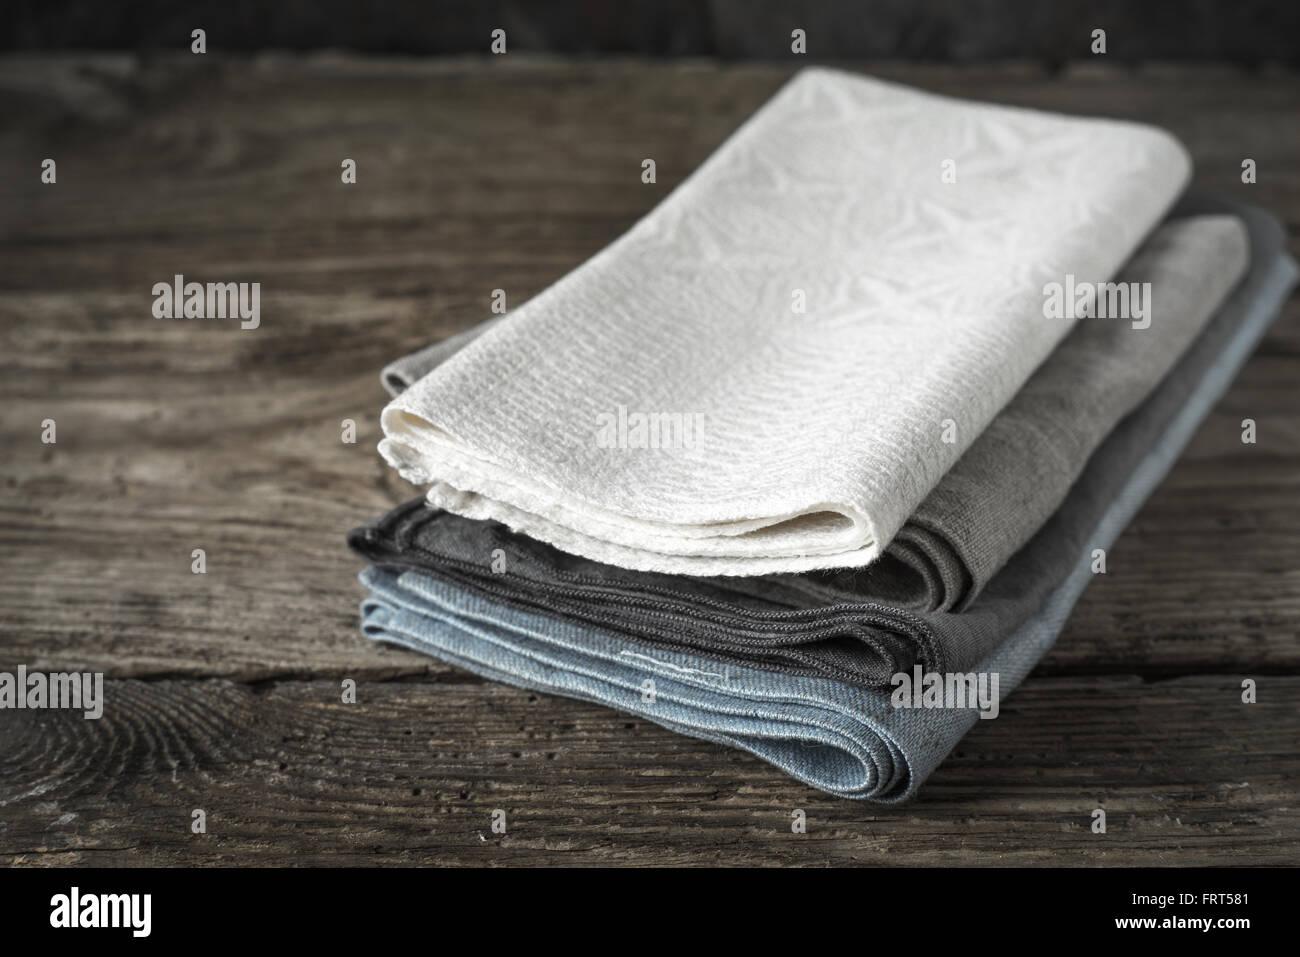 Napkin set on the wooden table horizontal - Stock Image